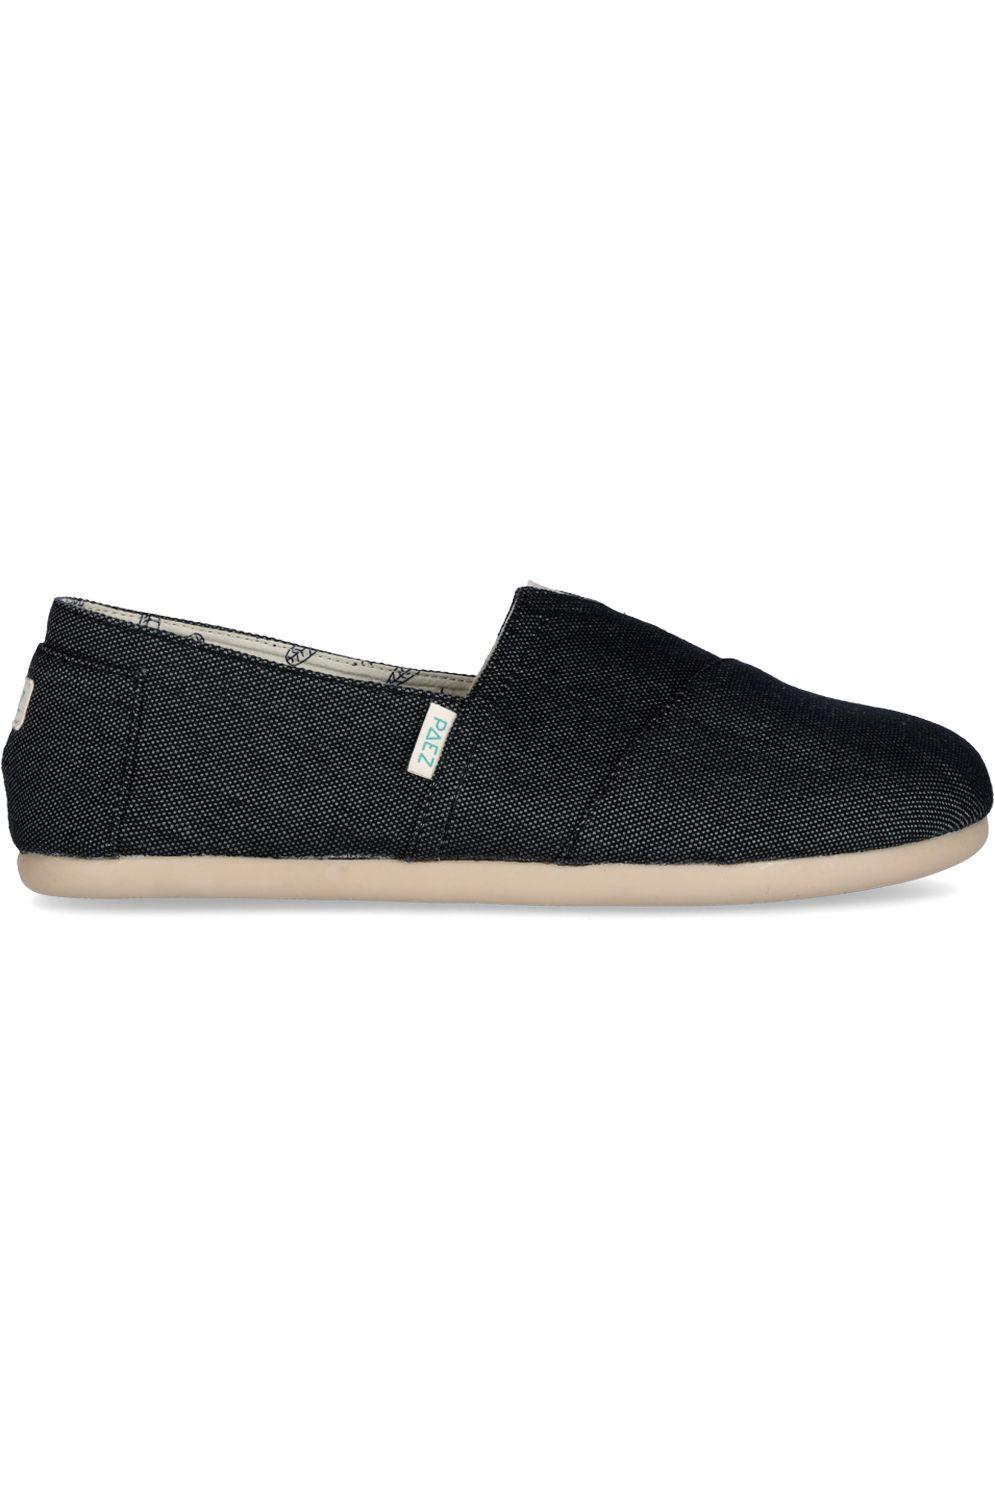 Paez Sandals COMBI Black